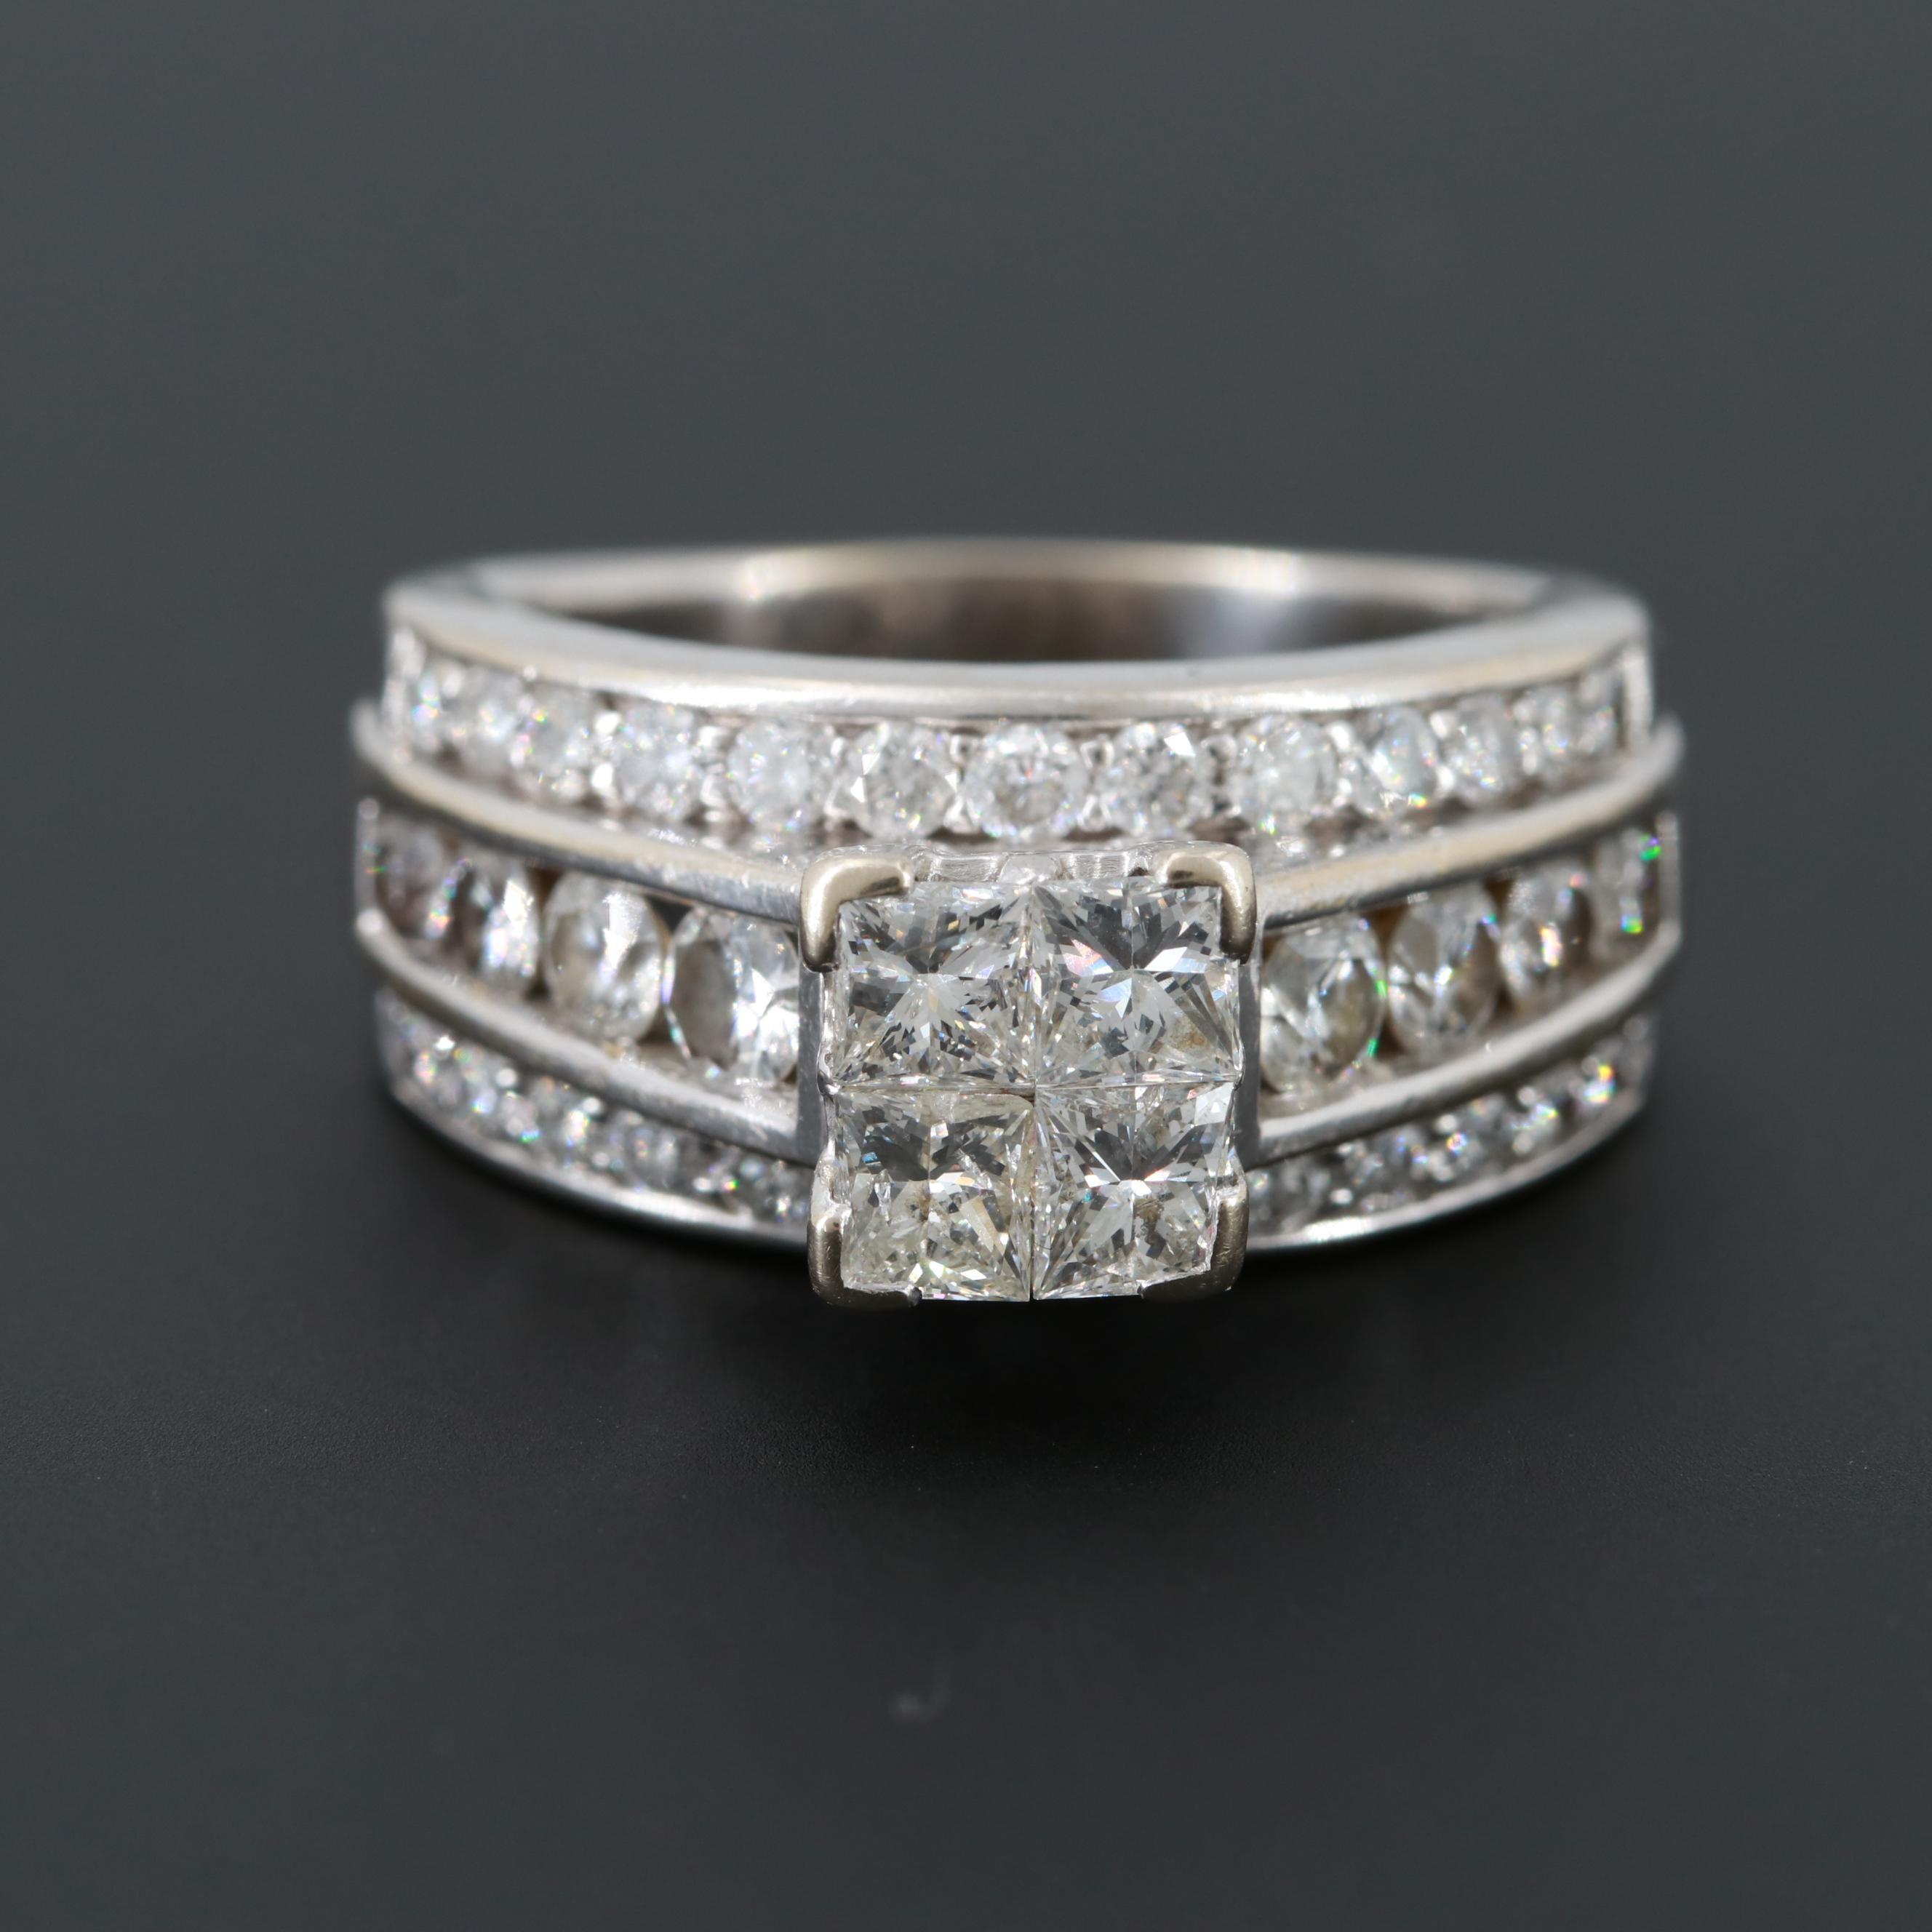 14K White Gold 2.74 CTW Diamond Ring